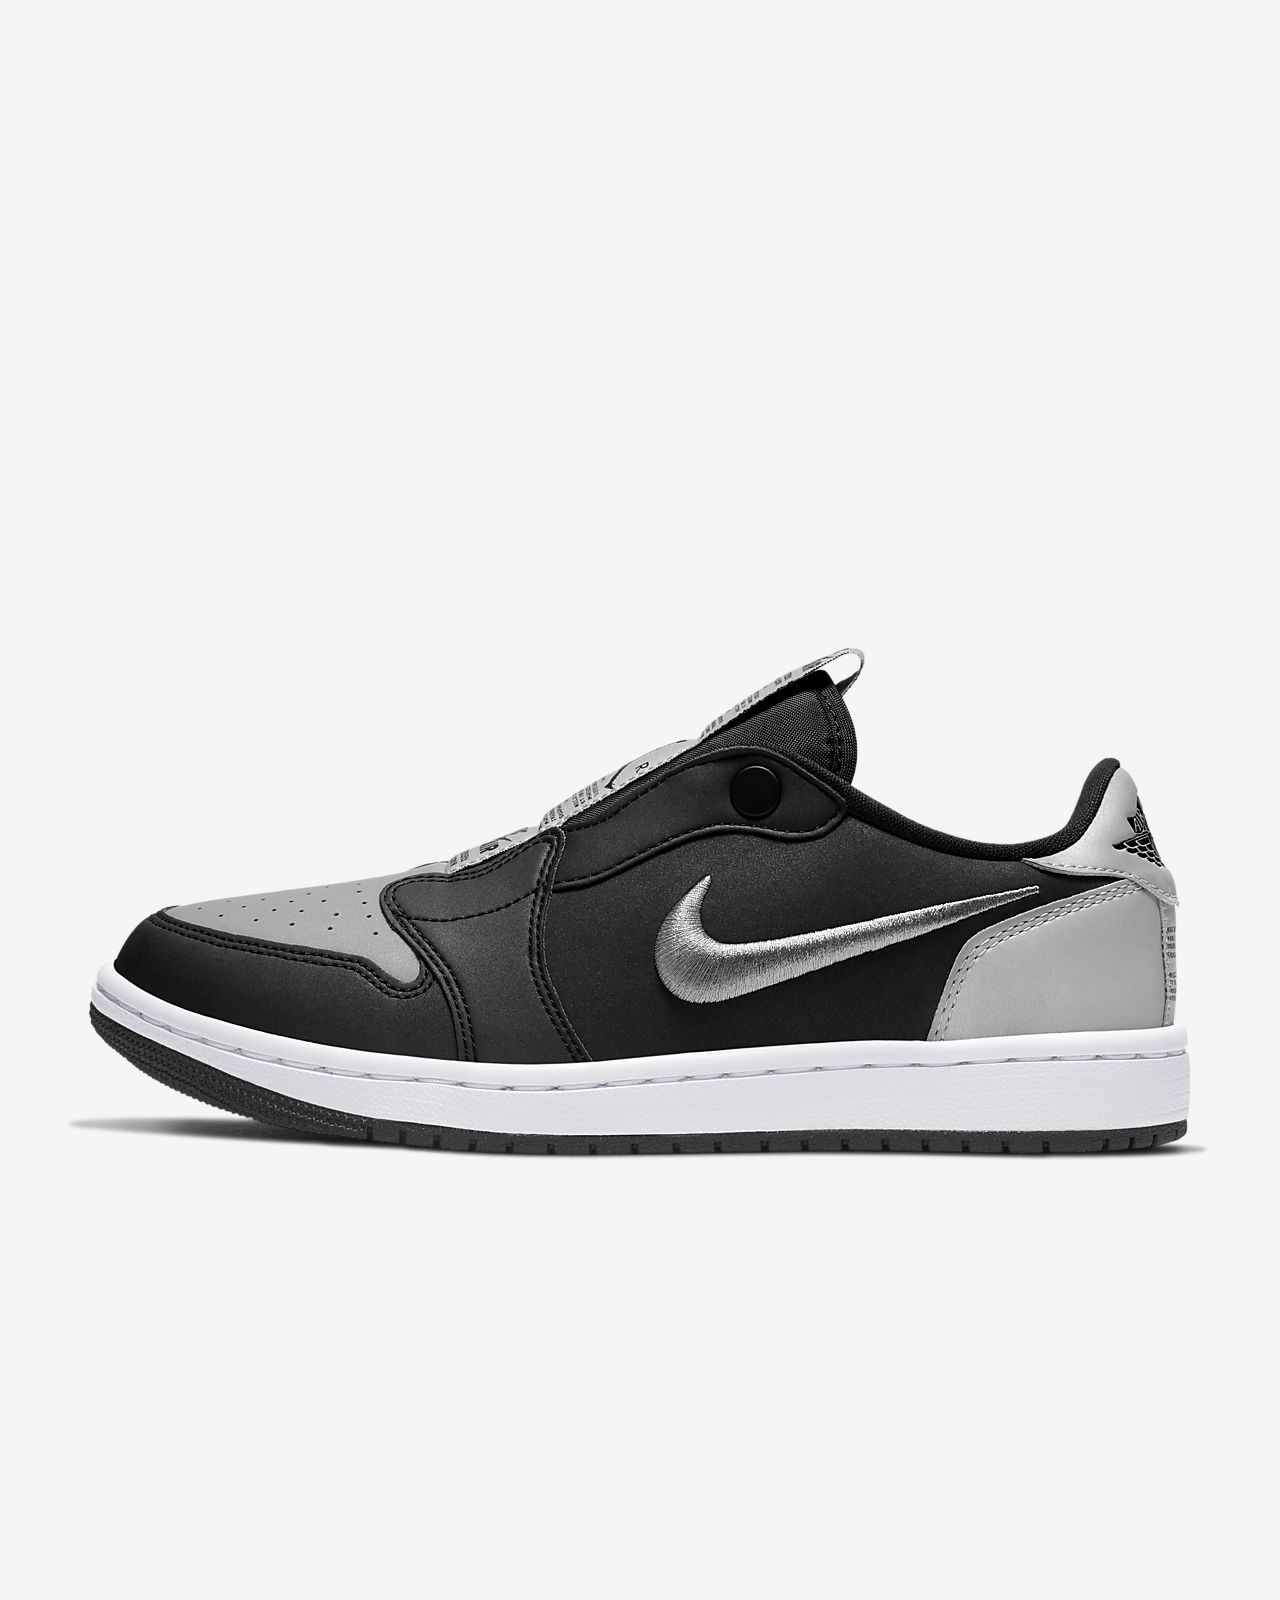 Air Jordan 1 Retro Low SE Women's Slip-On Shoe